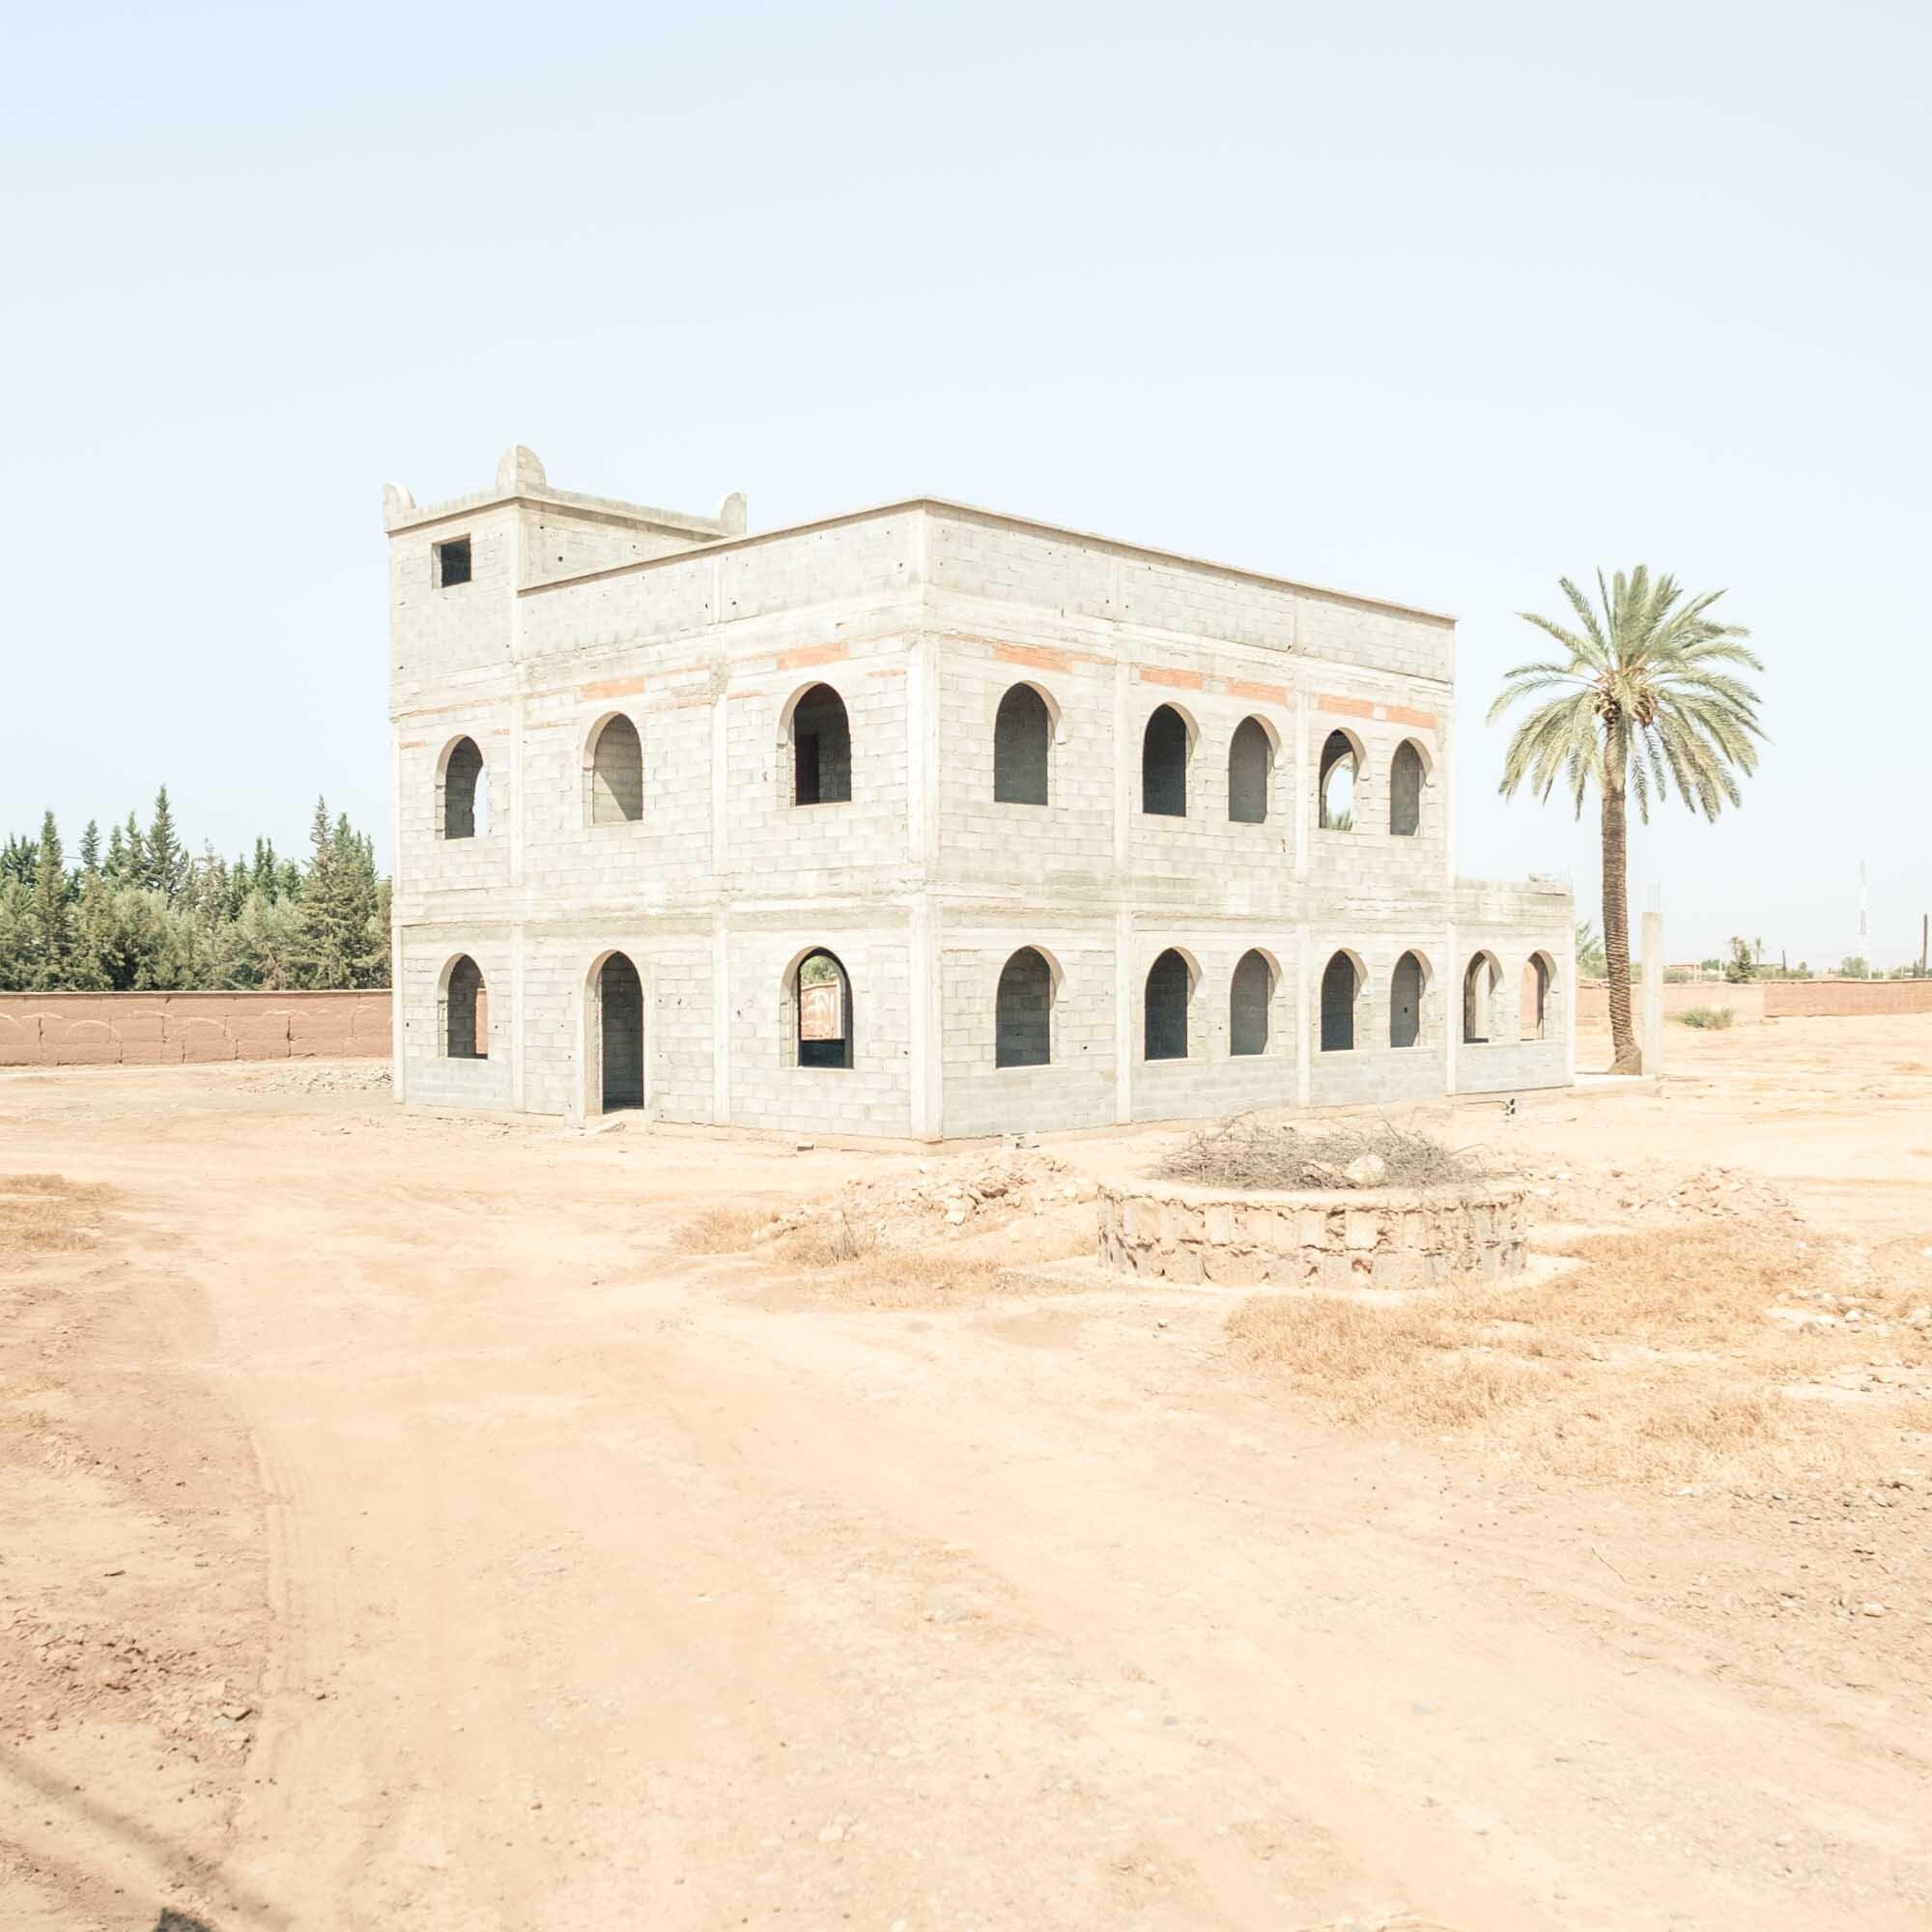 Loic_Vendrame_Morocco_03.jpg